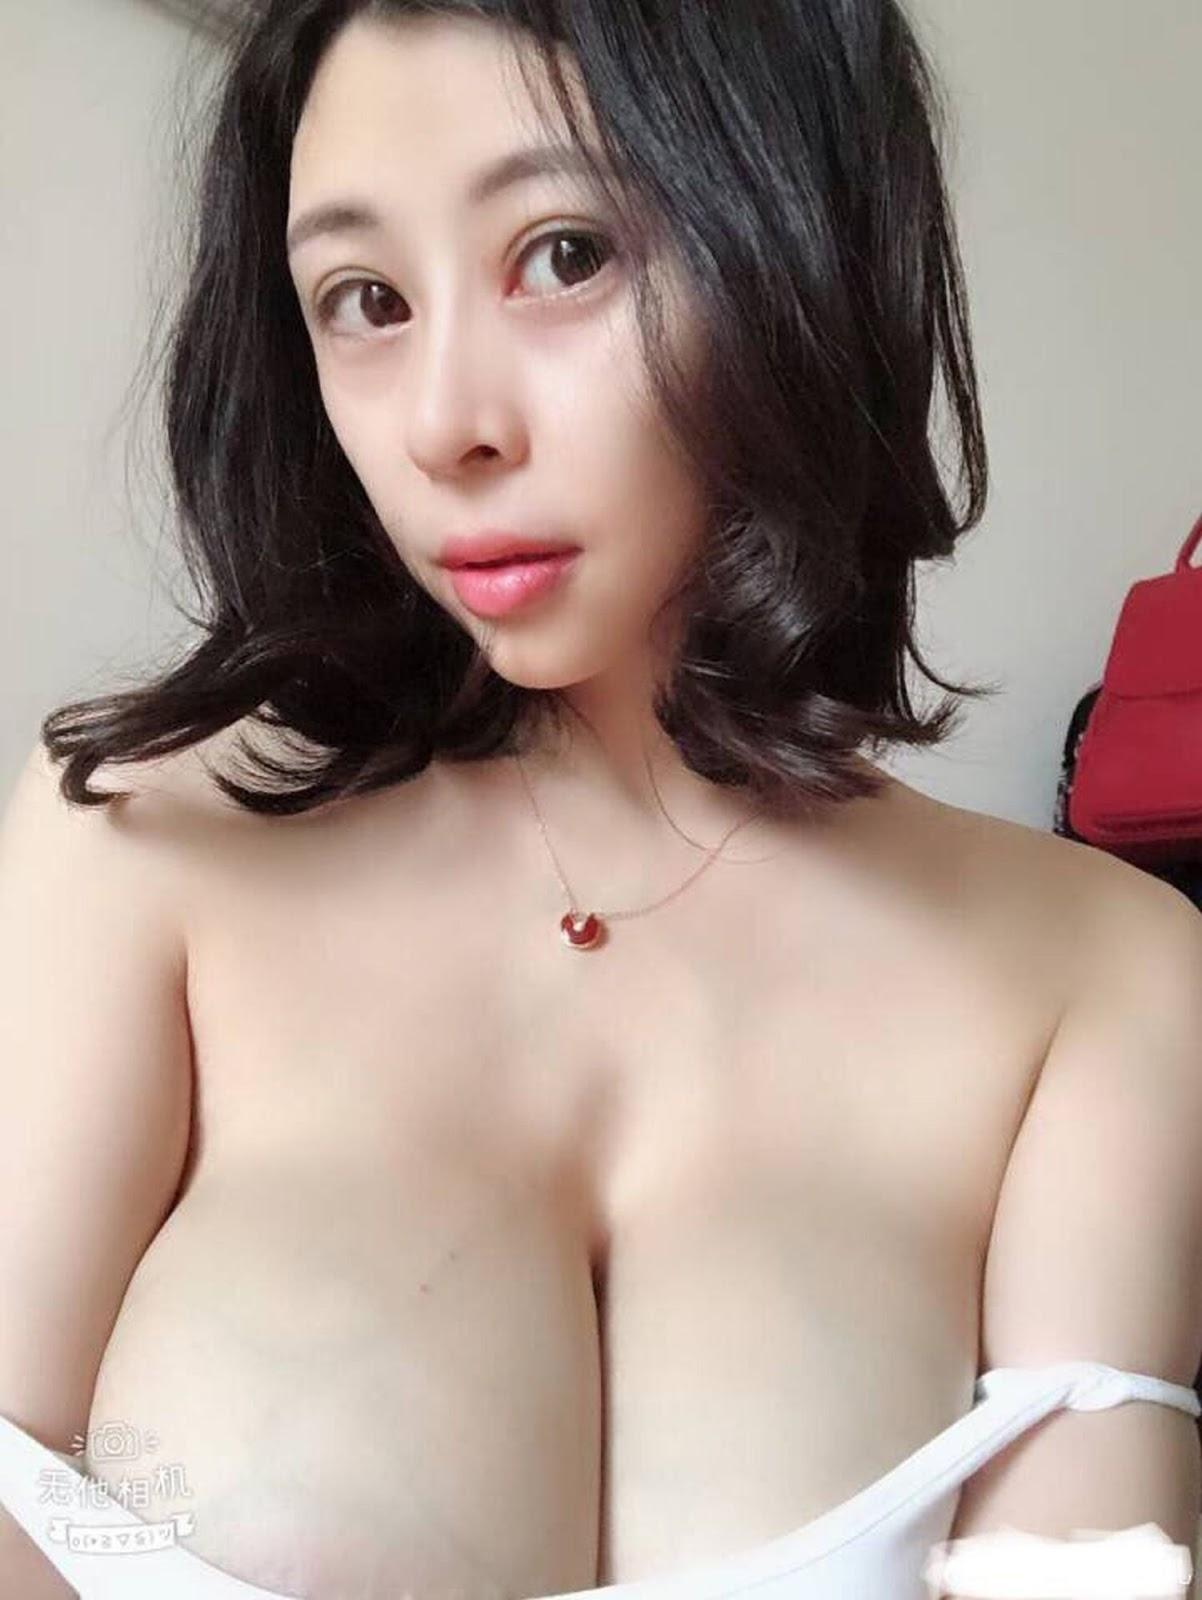 aHR0cHM6Ly93d3cubXlteXBpYy5uZXQvZGF0YS9hdHRhY2htZW50L2ZvcnVtLzIwMTkwOC8yMC8wODM0MjAwaXdncTl3Mm10NHlpdDZtLmpwZy50aHVtYi5qcGc%253D - 成都瓶儿 - Chengdu Pinger big tits selfie nude 2020